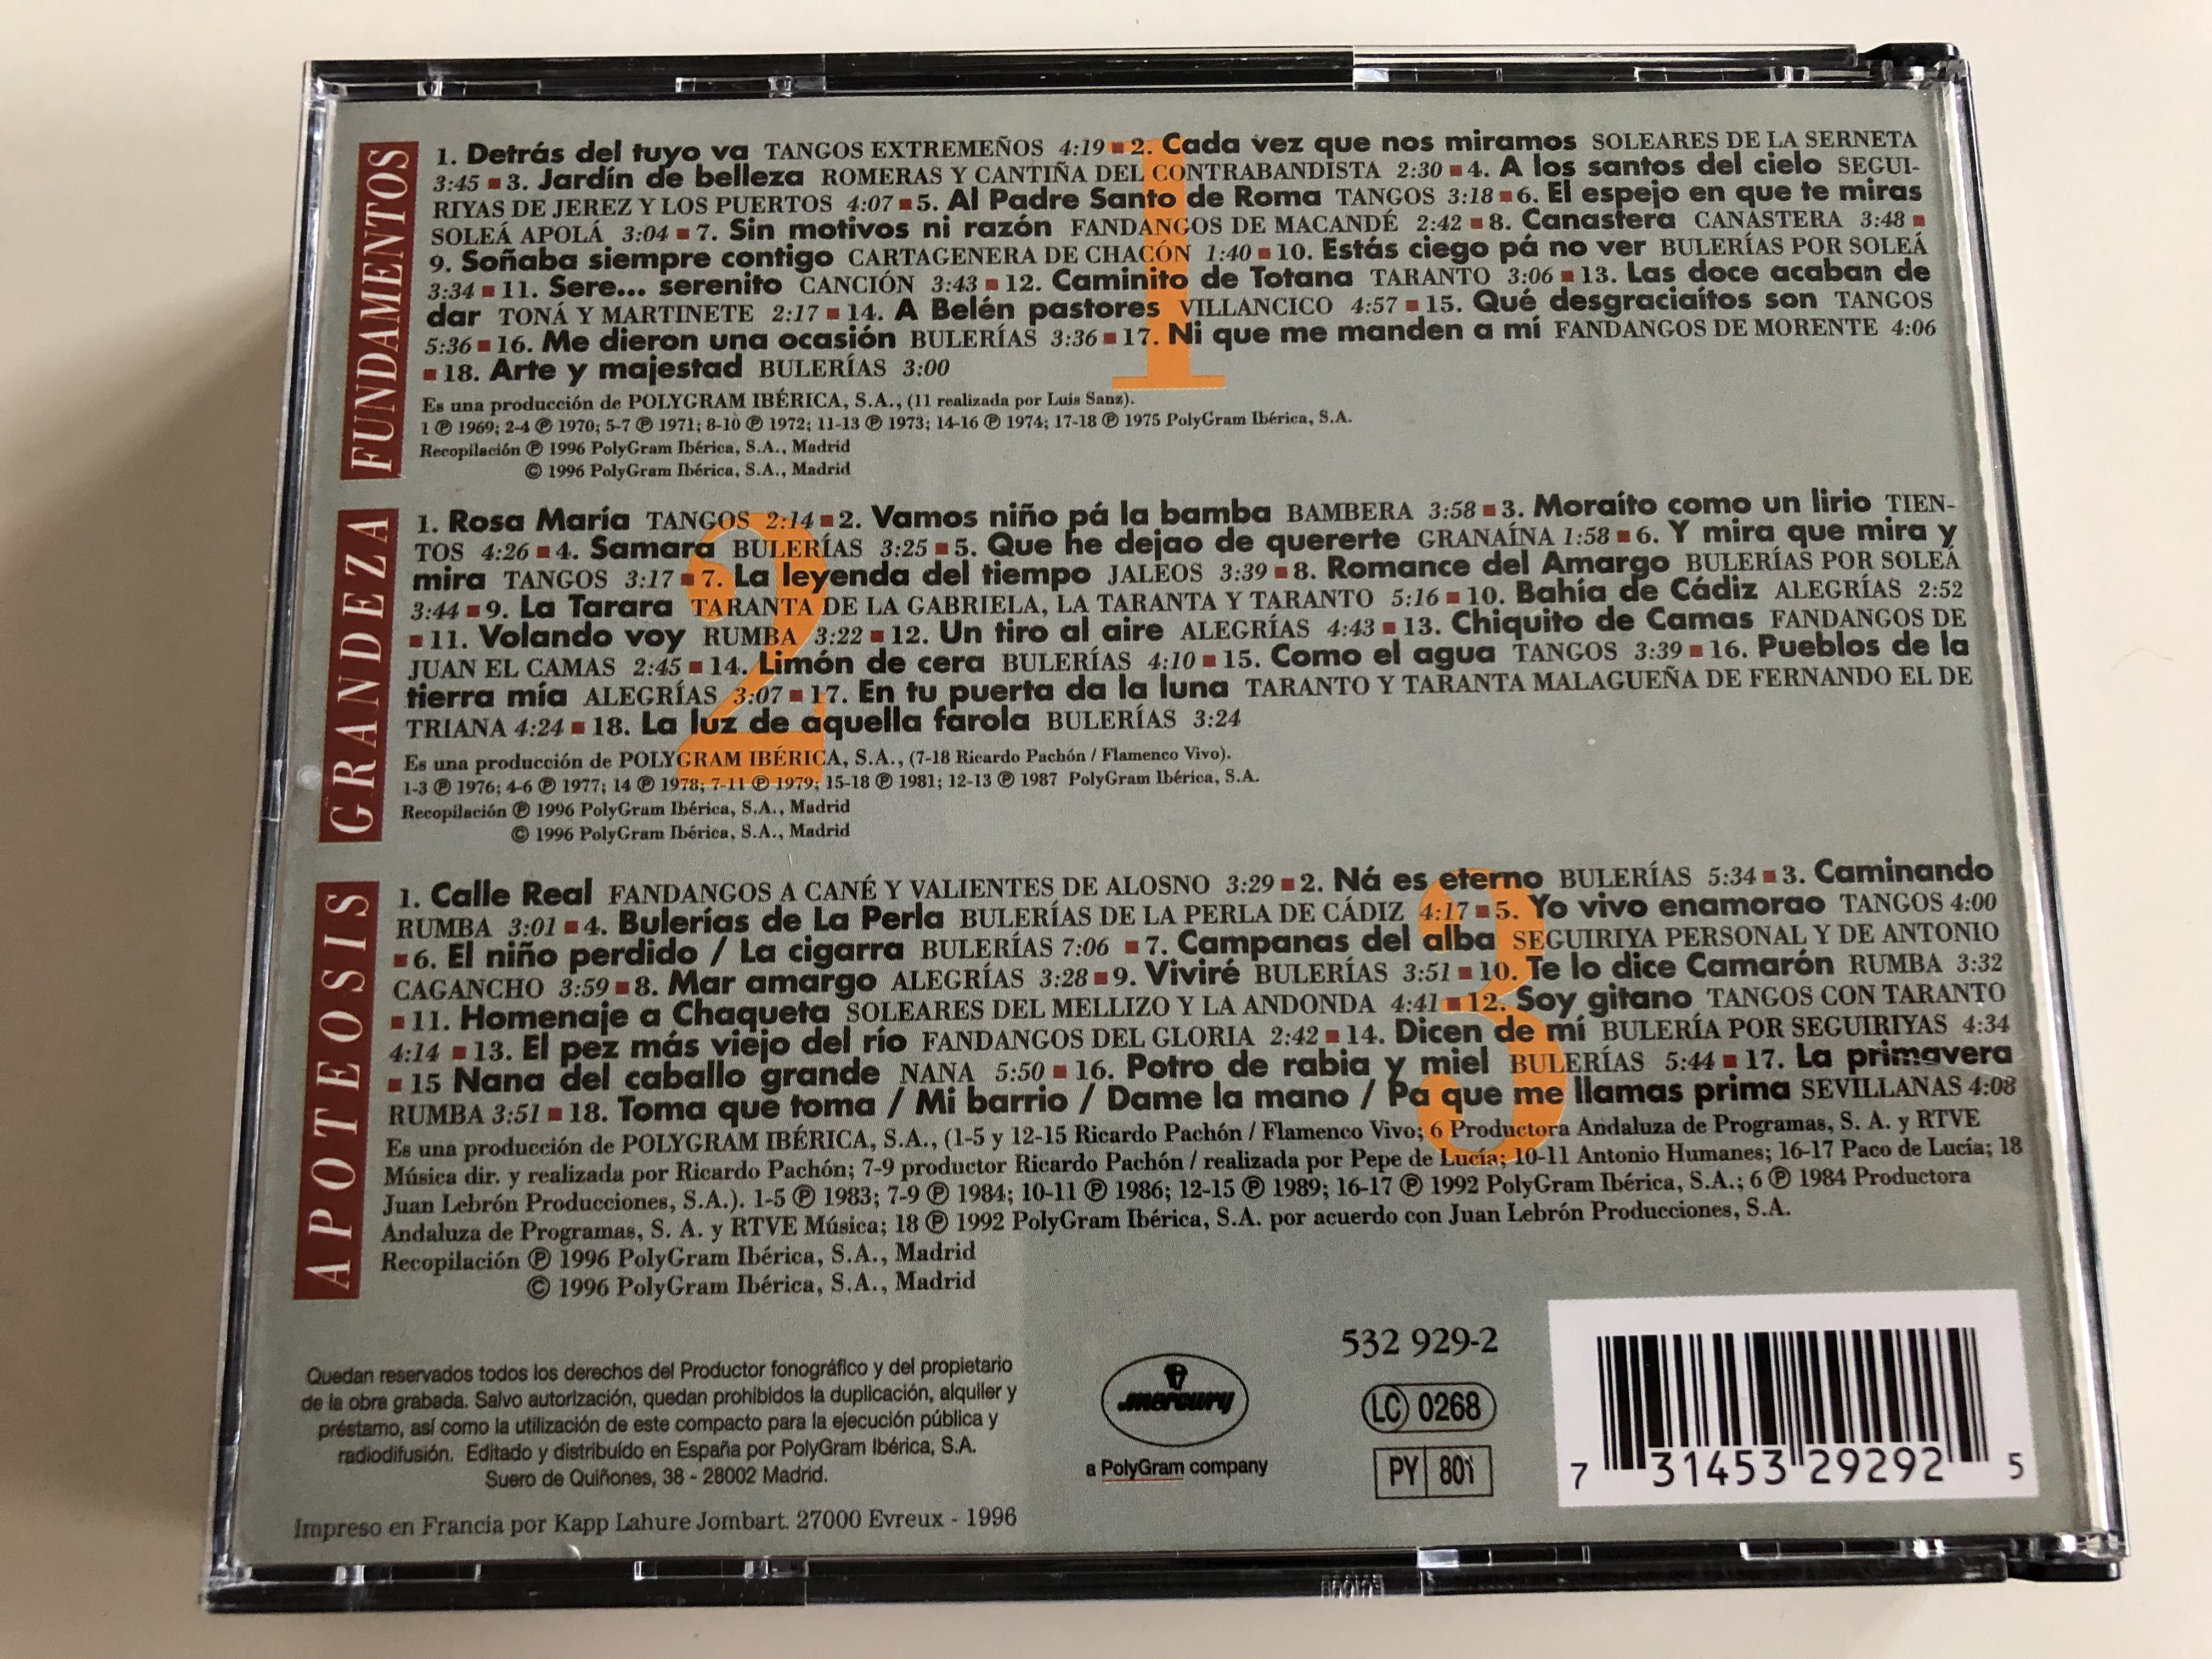 camar-n-antologia-anthology-3-audio-cd-set-1996-vol-1-3.-fundamentos-grandeza-apoetosis-polygram-4-.jpg